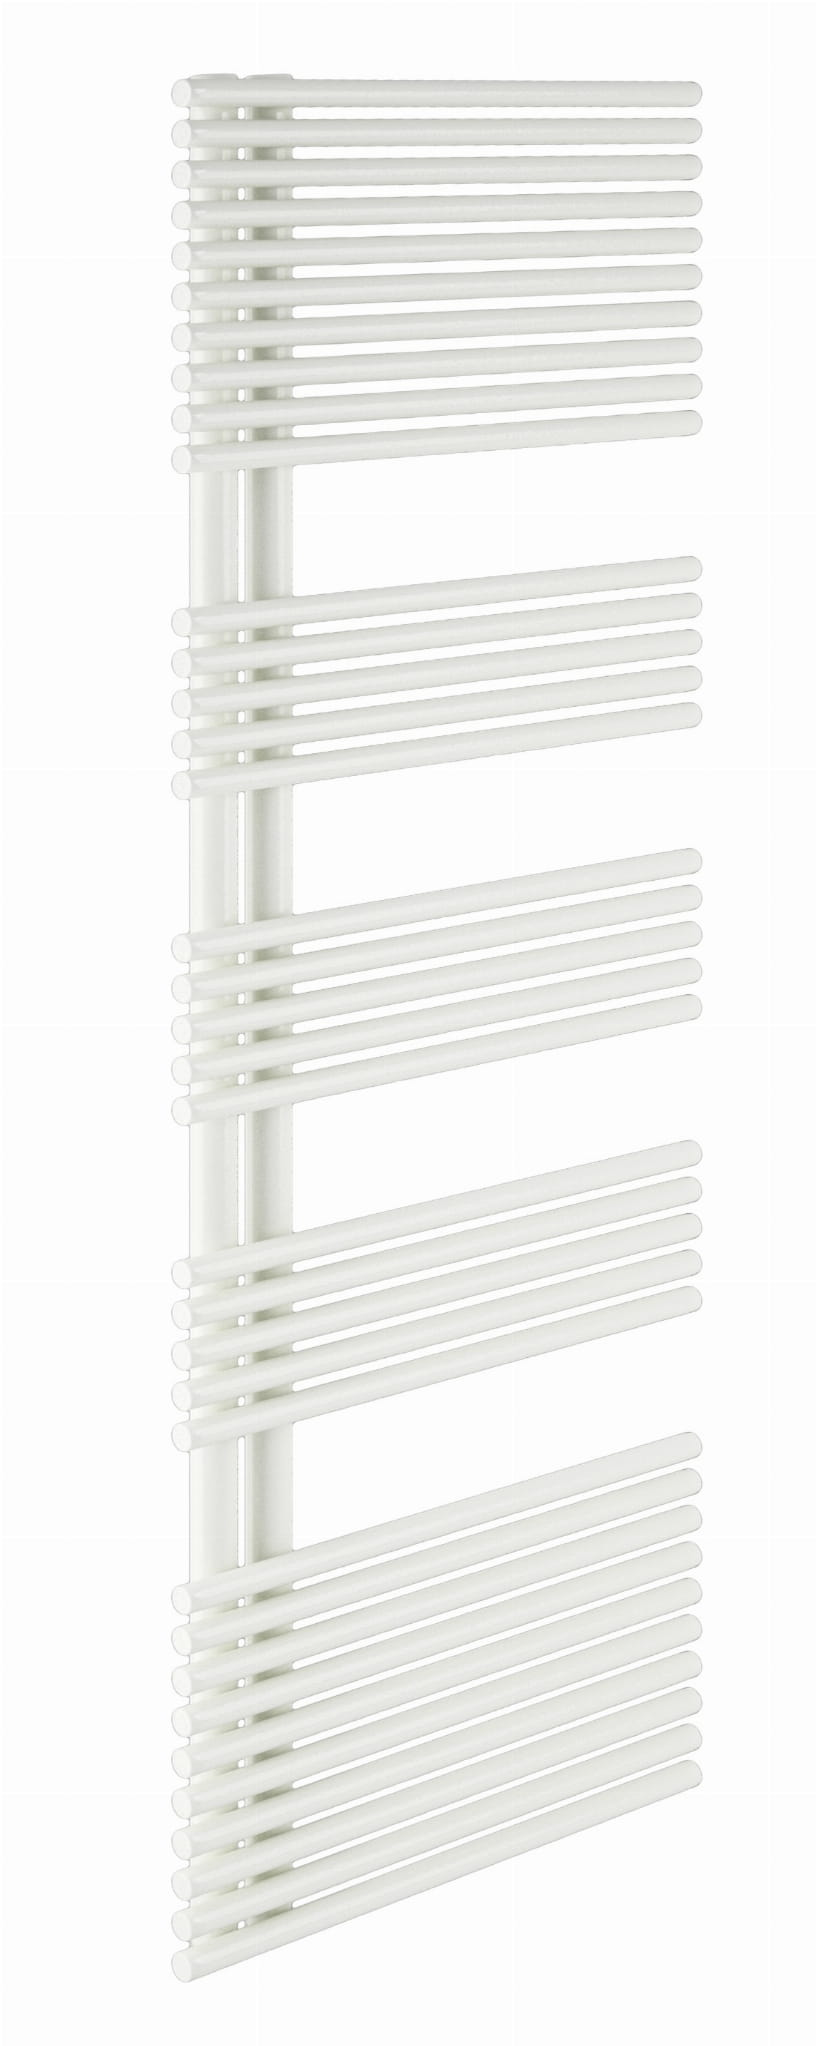 Sanotechnik - WIEN - Kúpeľňové kúrenie biele 900W 60 x 170,8 cm